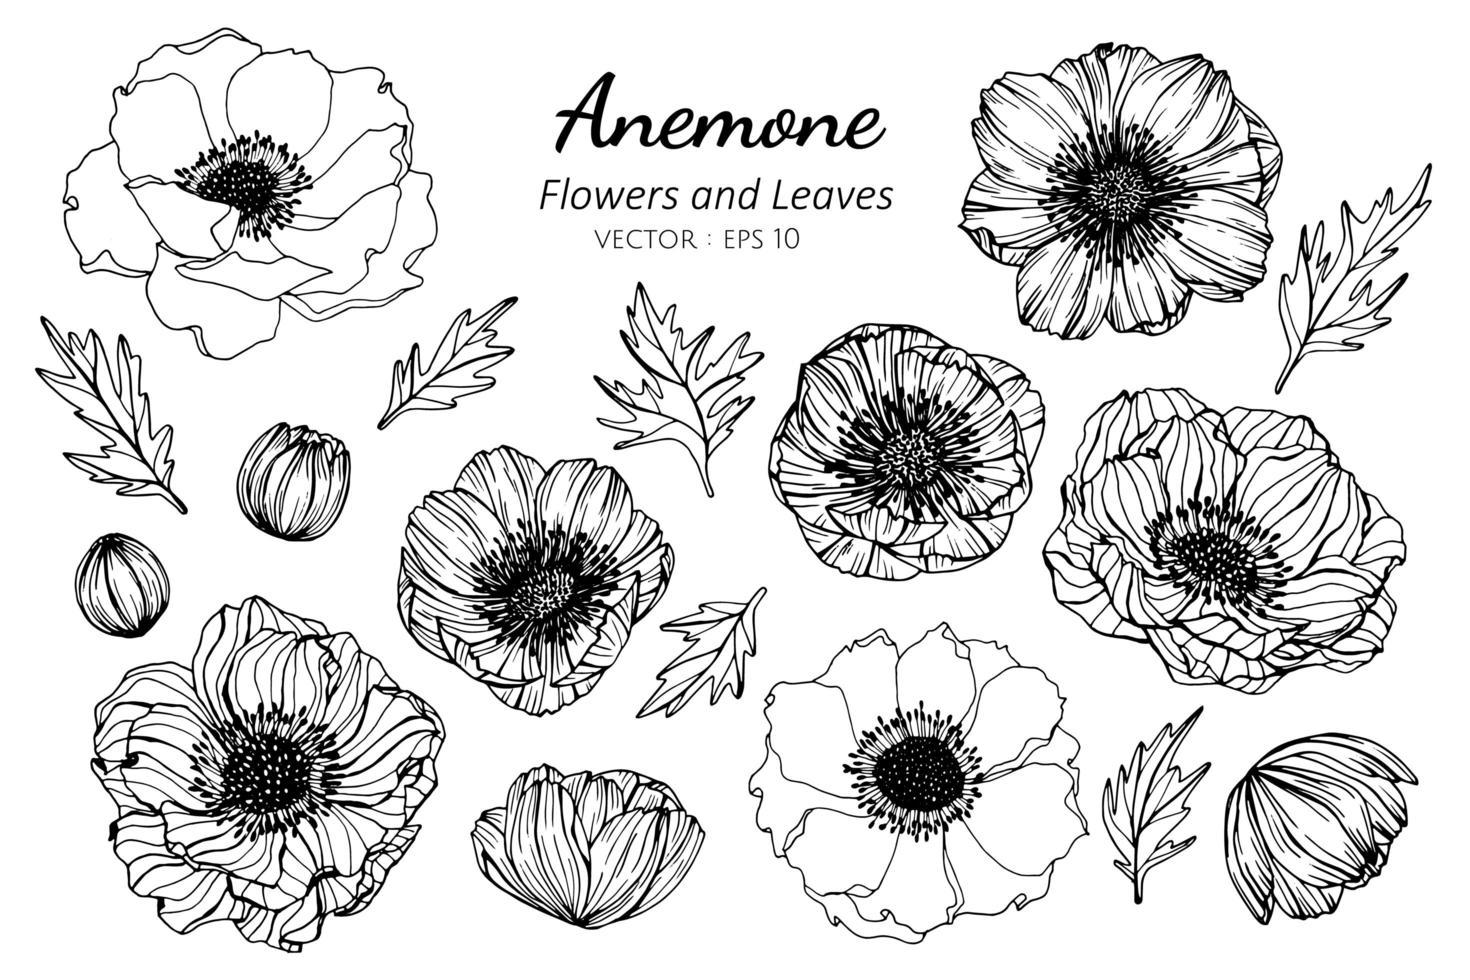 raccolta di foglie e fiori di anemone vettore